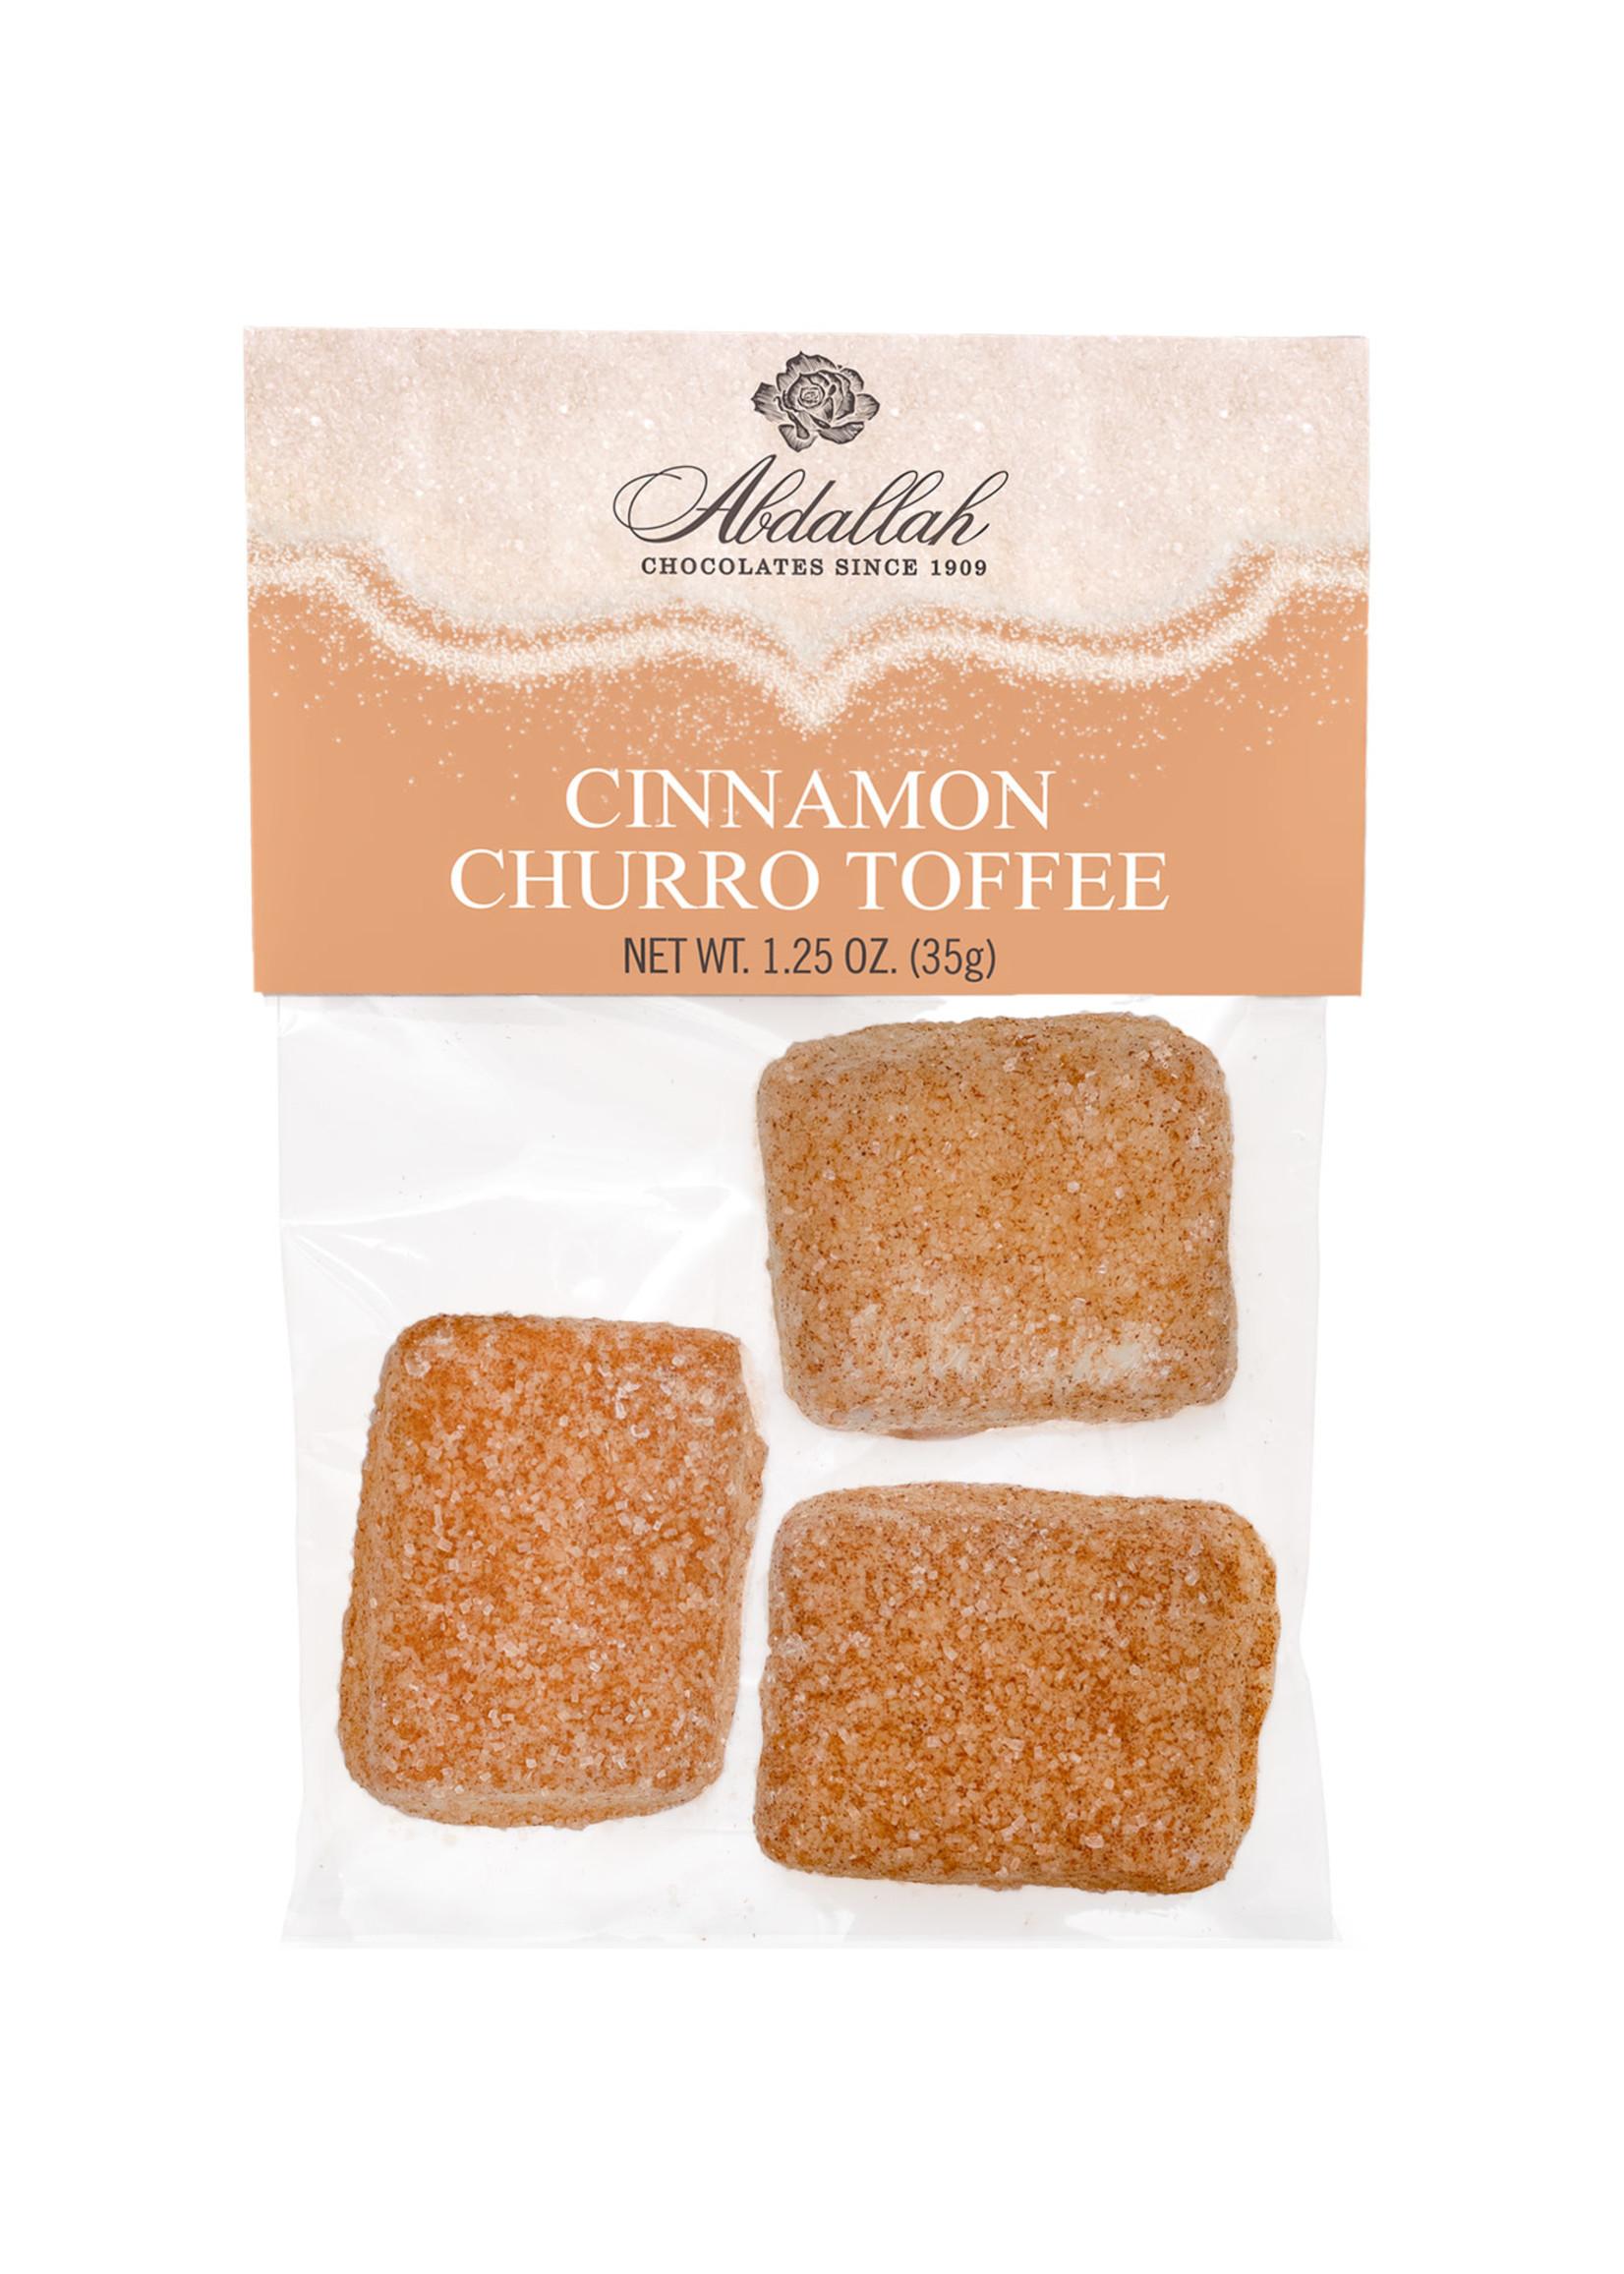 Abdallah Cinnamon Churro Toffee Single